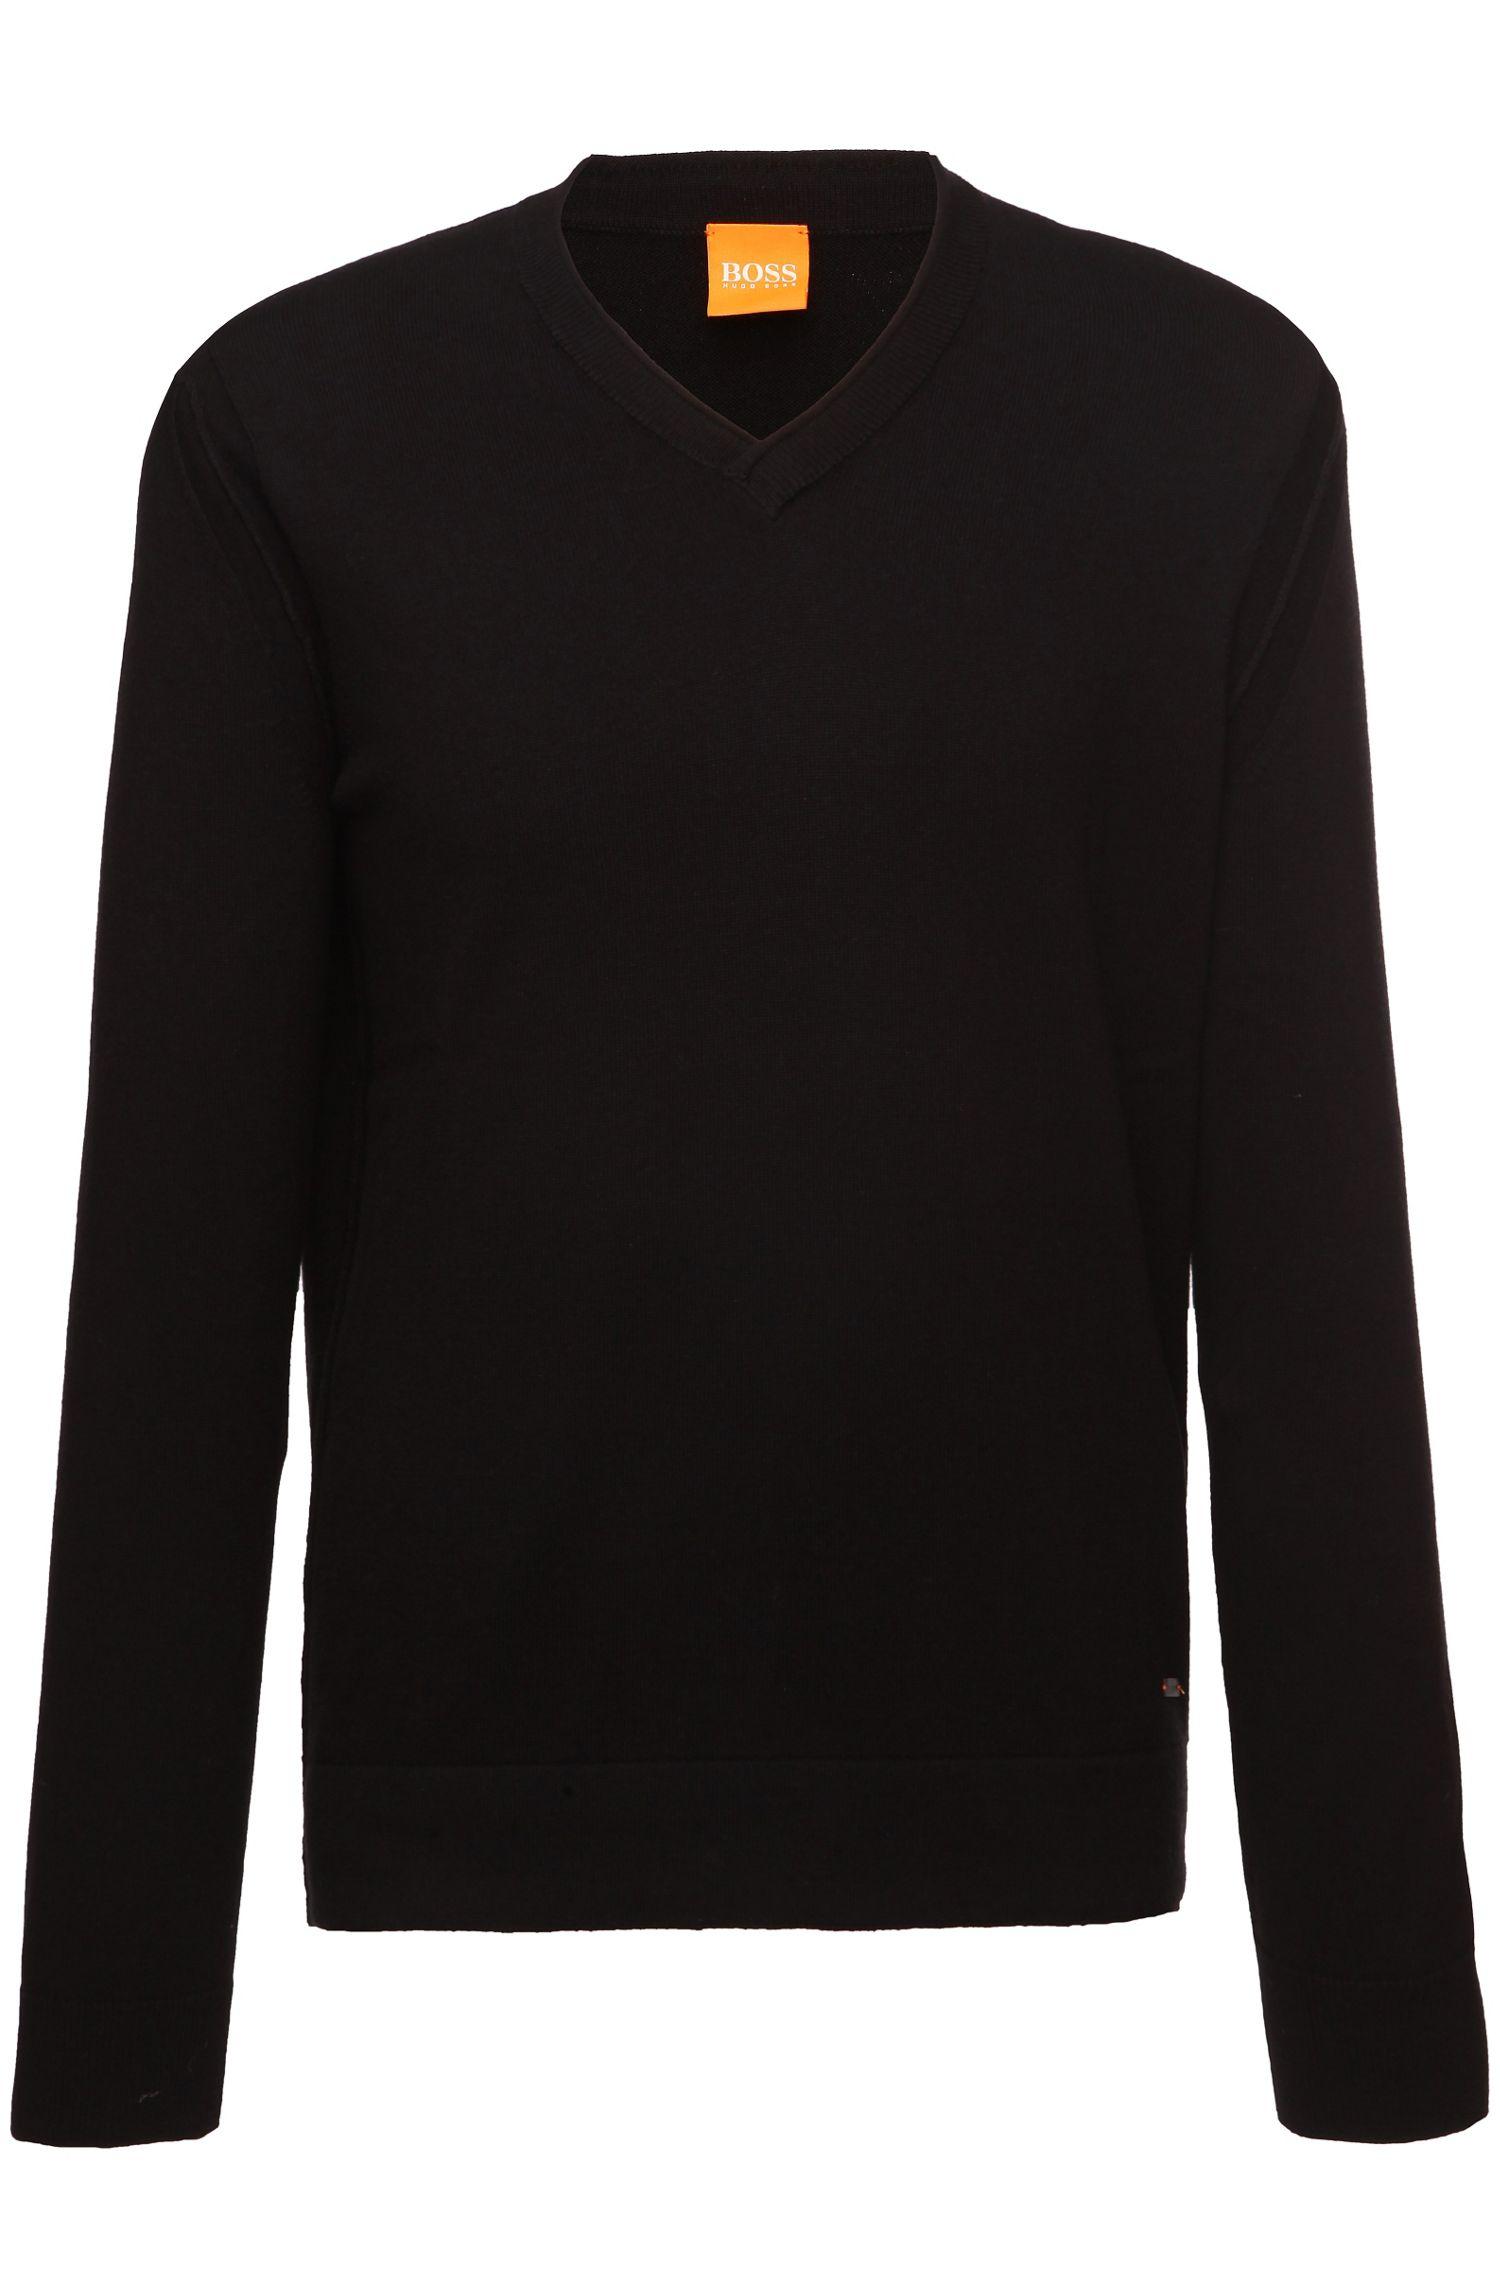 'Albino'   Cotton Virgin Wool Blend V-Neck Sweater